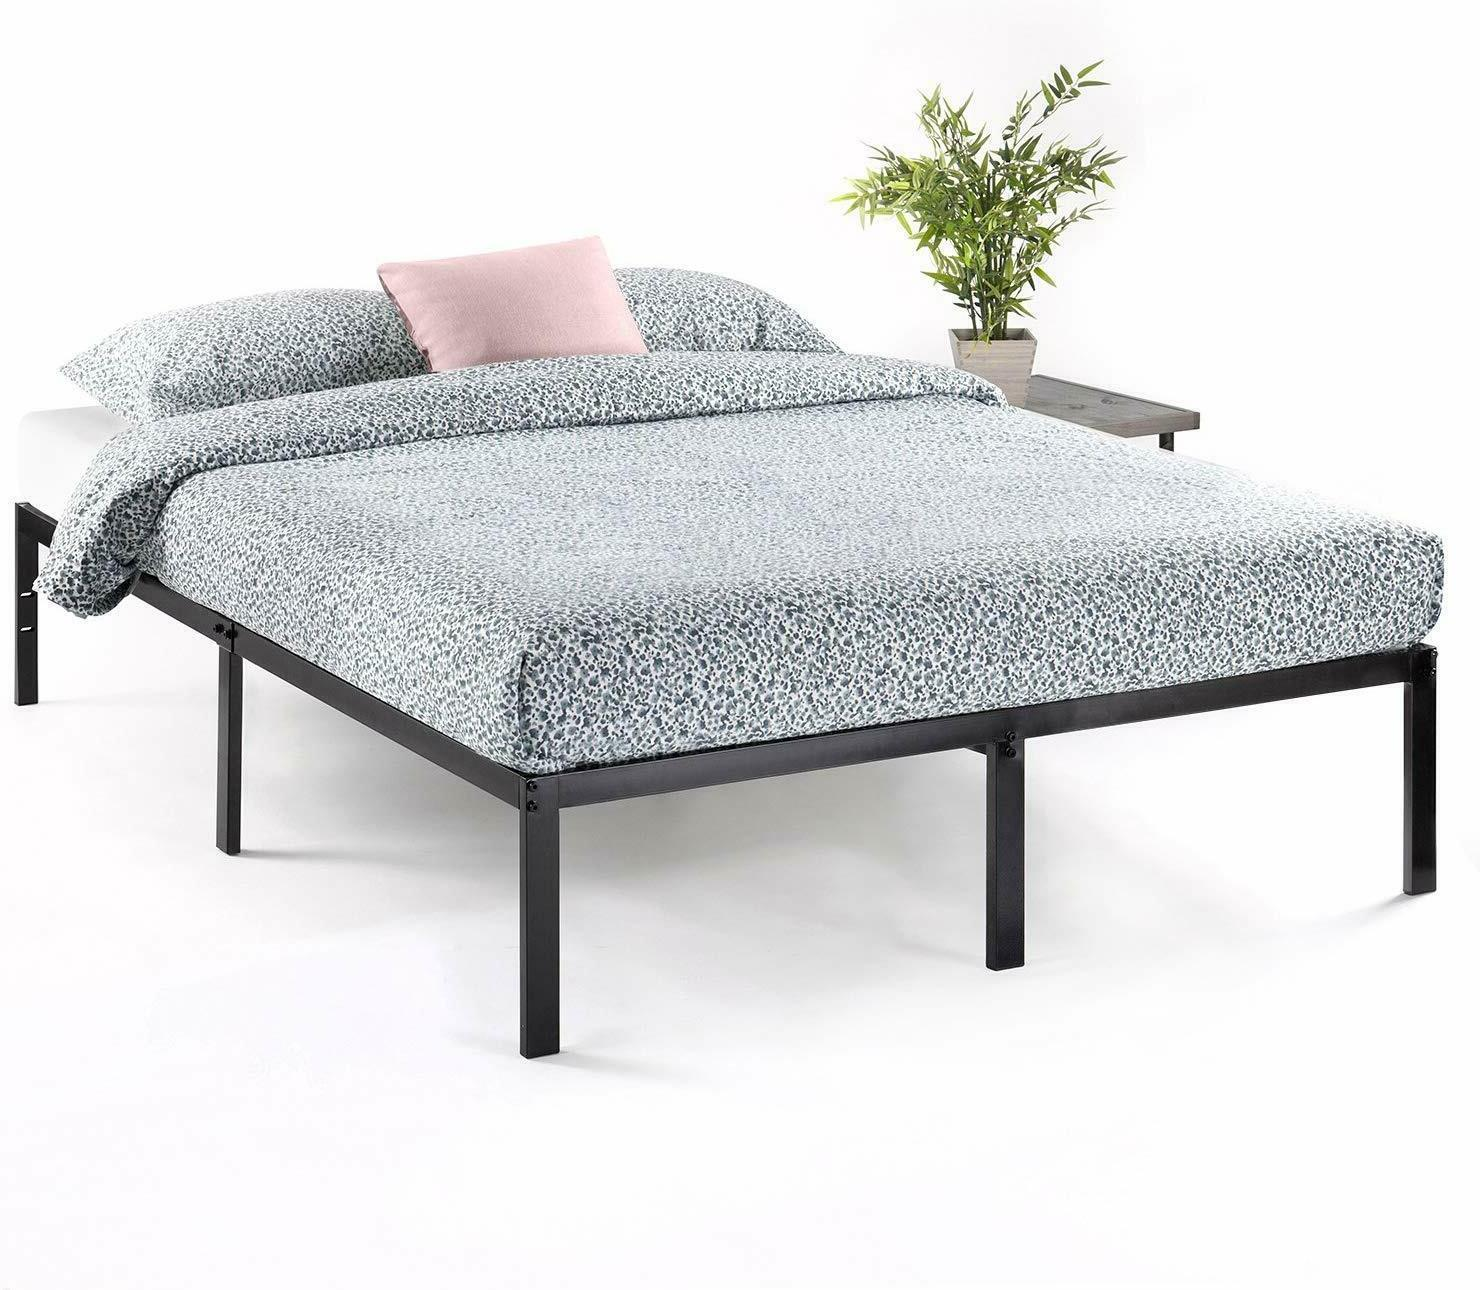 Best Price Mattress Full Inch Metal Platform Beds Mattress , Black